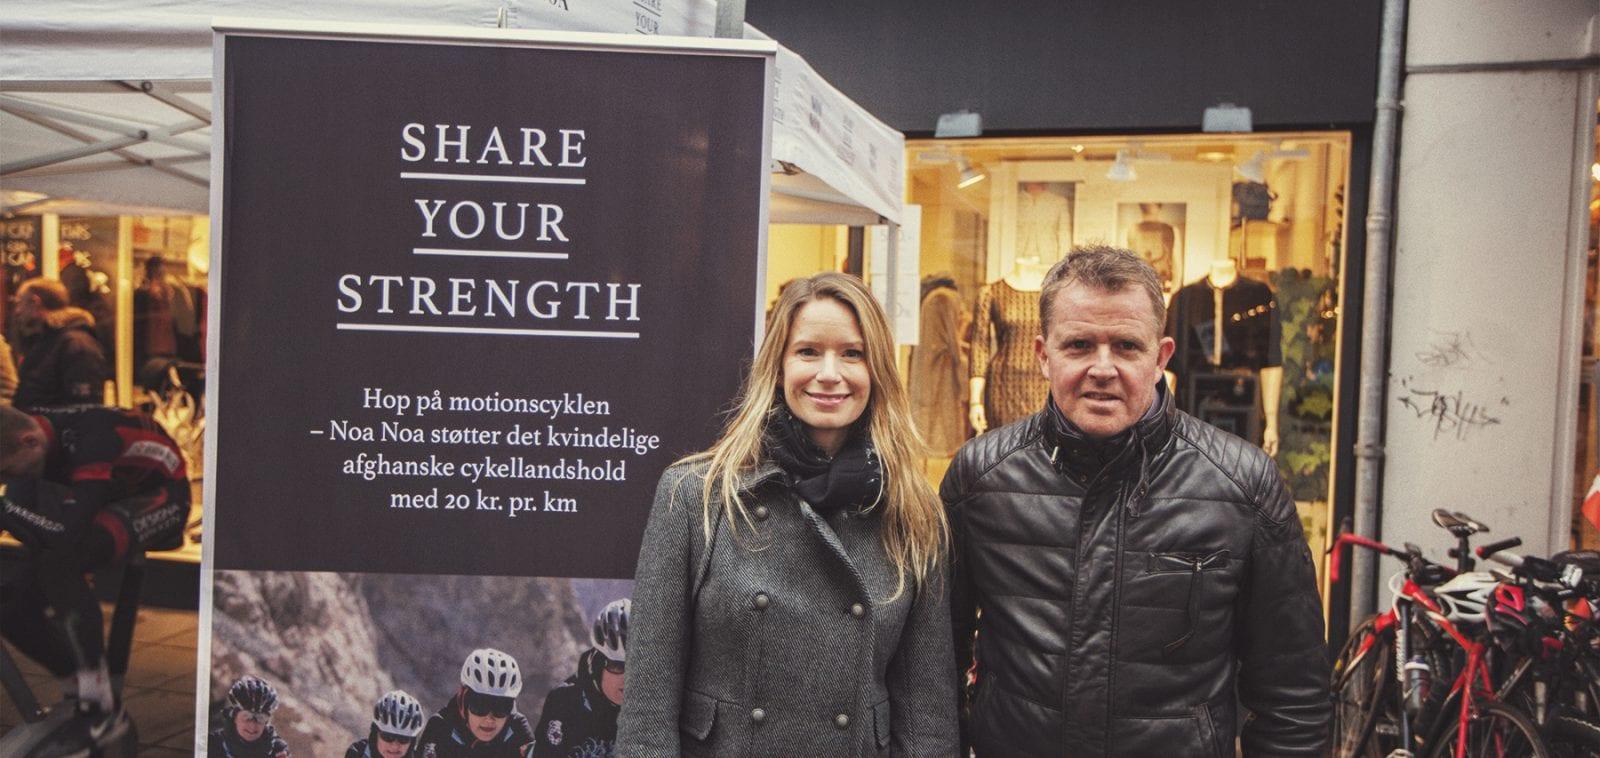 Shannon Galpin og Rolf Sørensen Silkeborg Noa Noa 2014 Share your Strenght © Photo: Uggi Kaldan // AltomCykling.dk